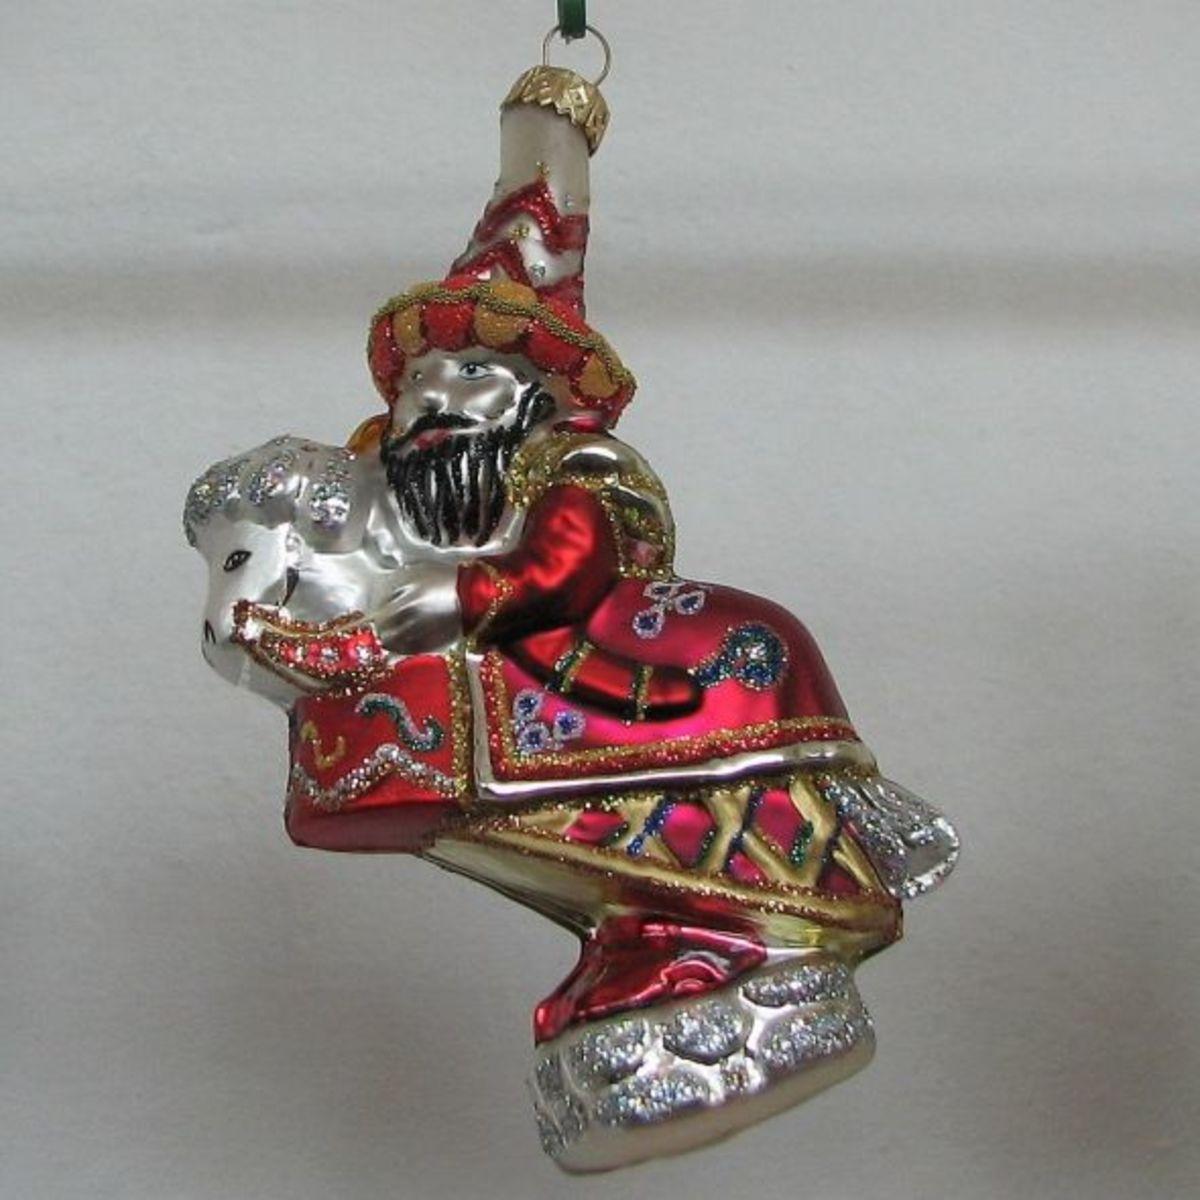 Lajkonik - from a Krakovian Tale -  Tartar Rider and His Horse